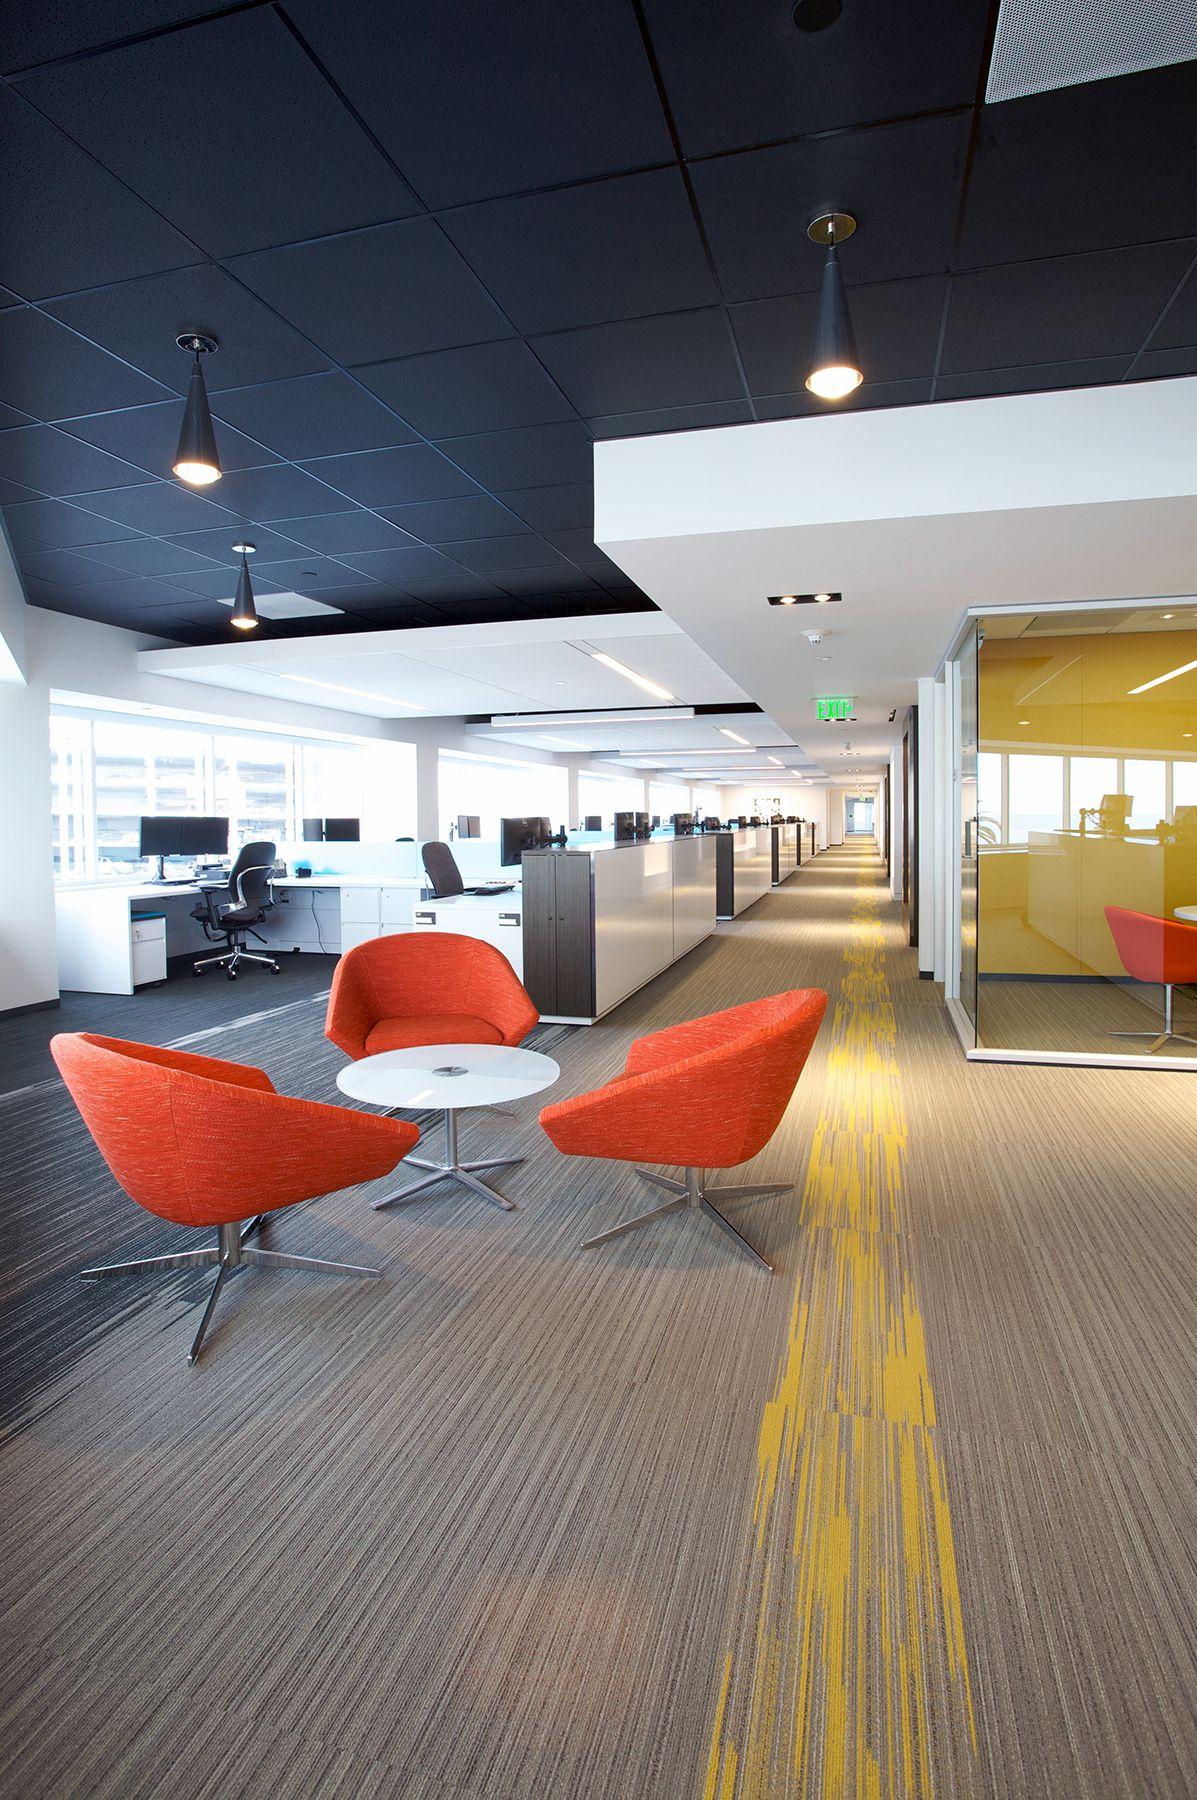 Pingl sur espace commercial - Signe different open office ...